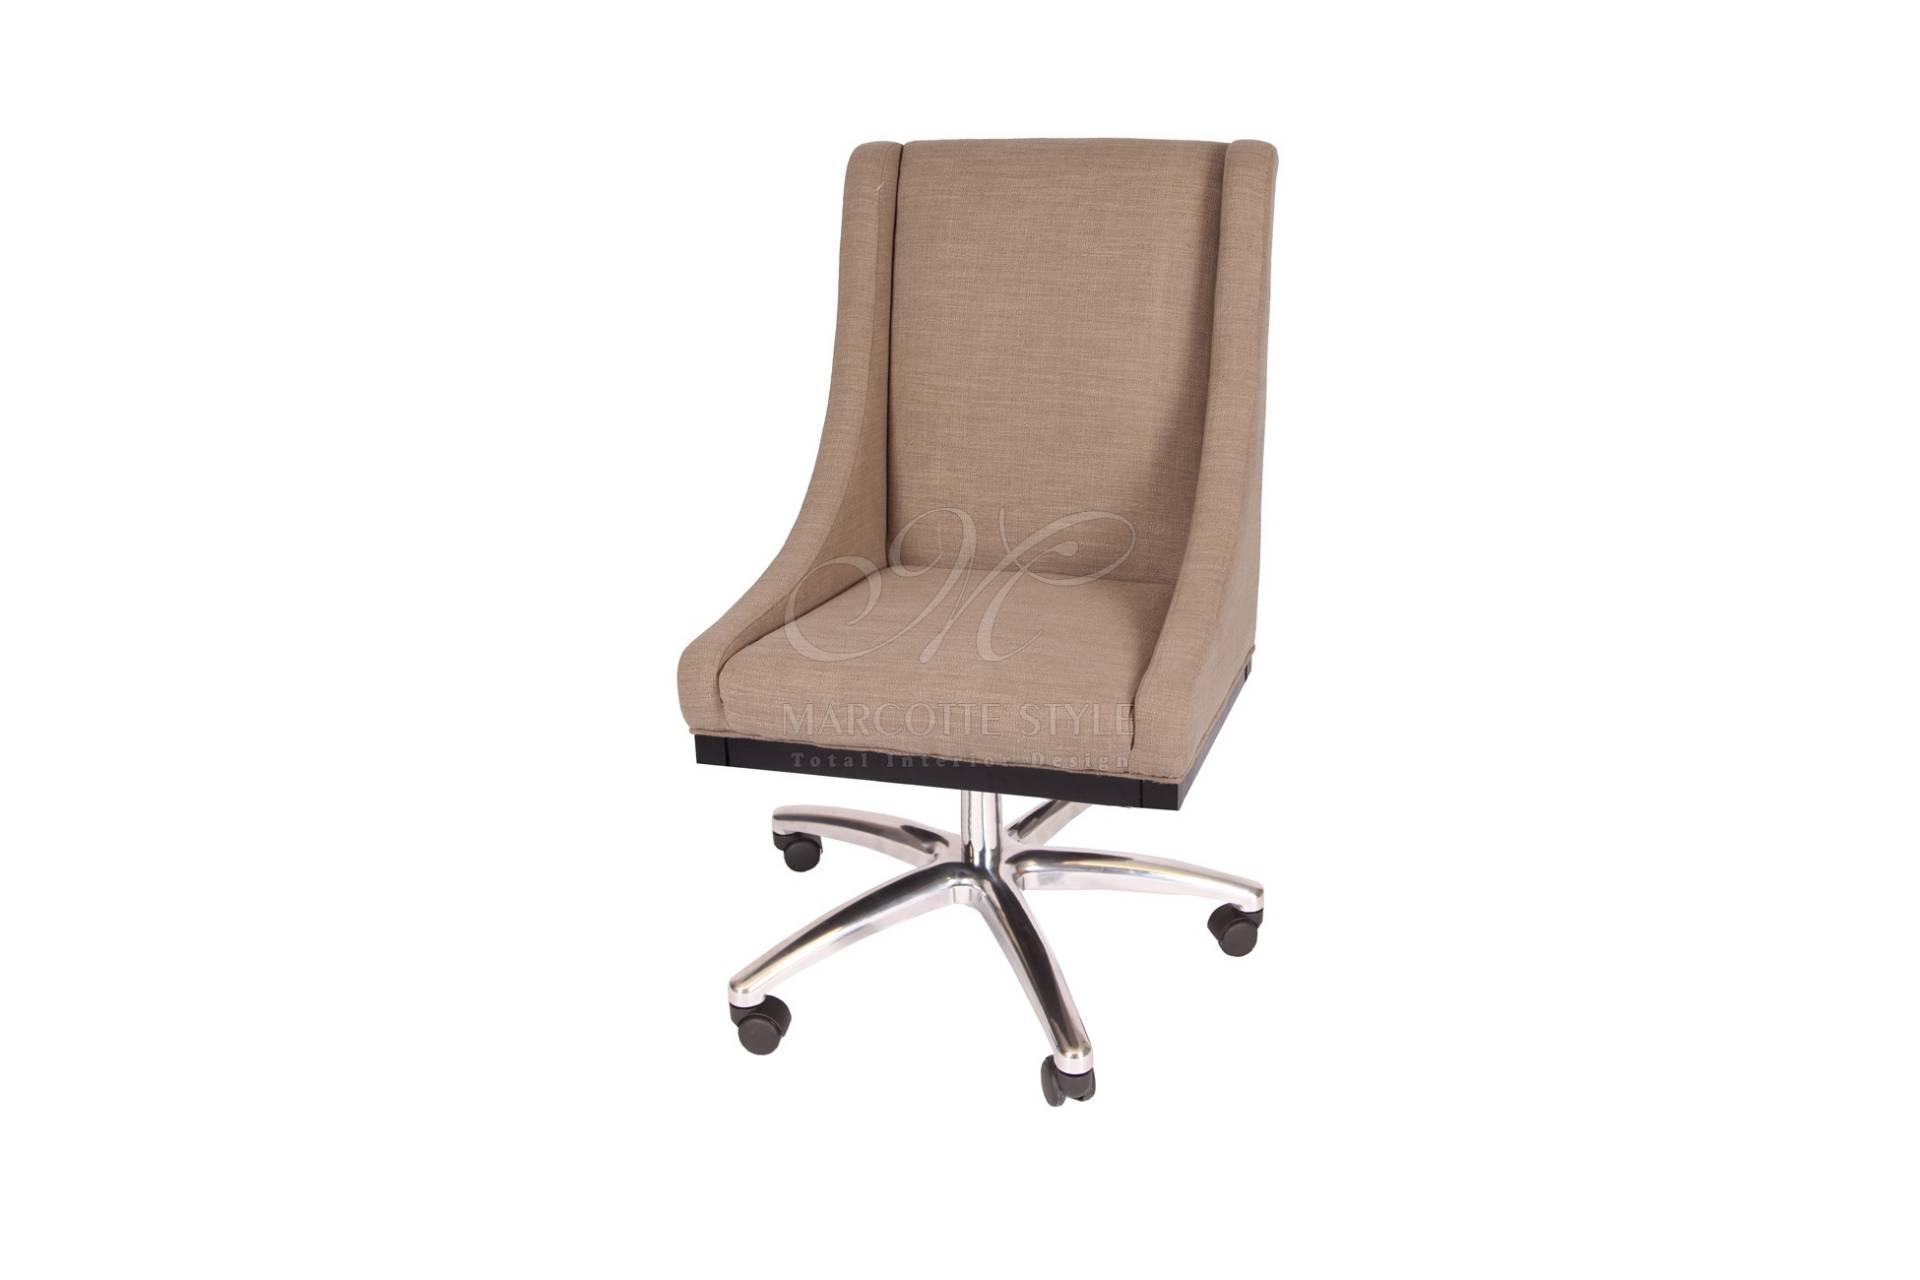 Marcottestyle offrcechair bureau stoel galaxy marcotte style